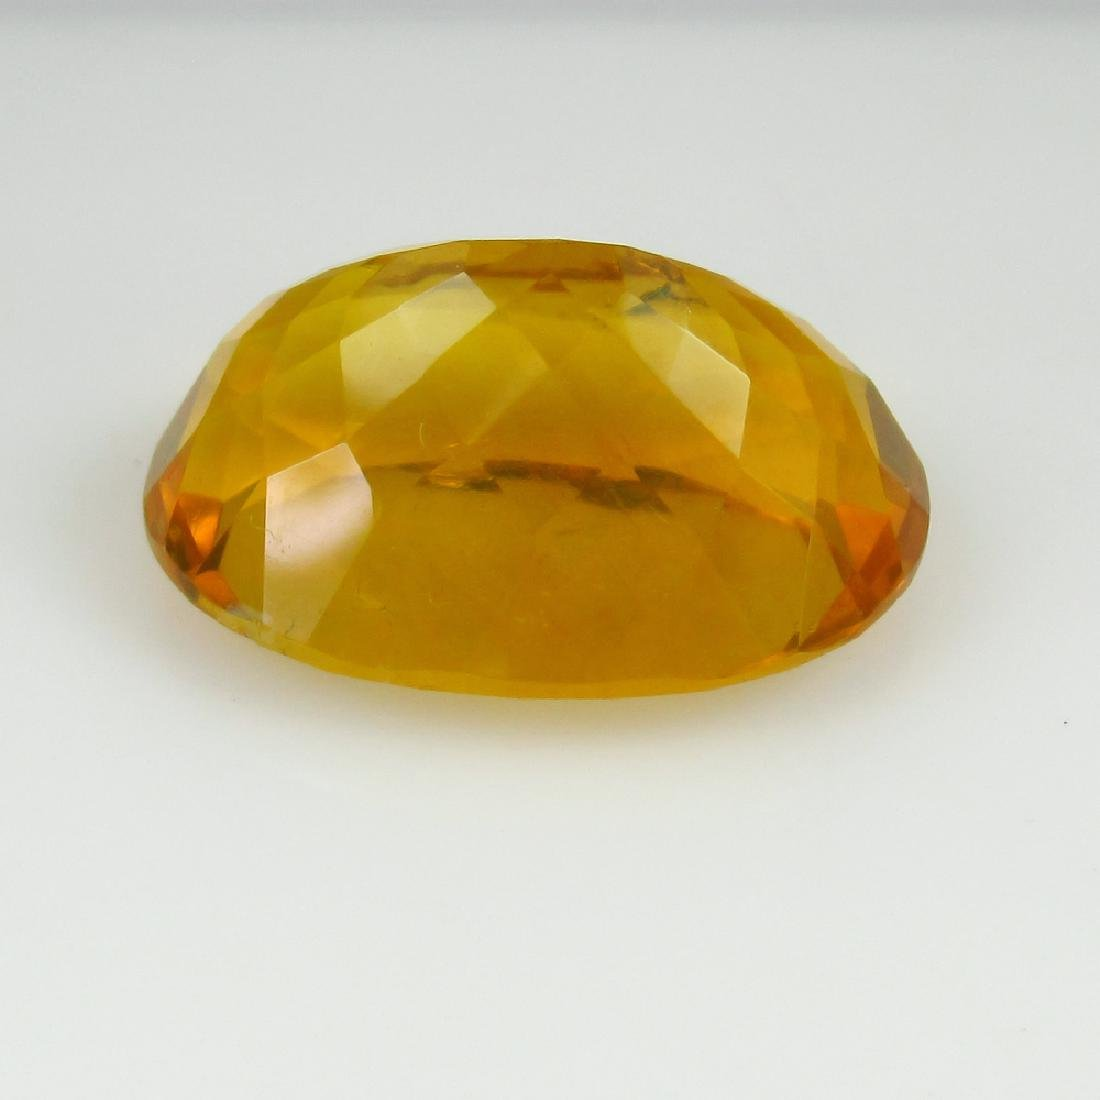 19.44 Ct Genuine Loose Yellow Flourite Nice Oval cut - 2